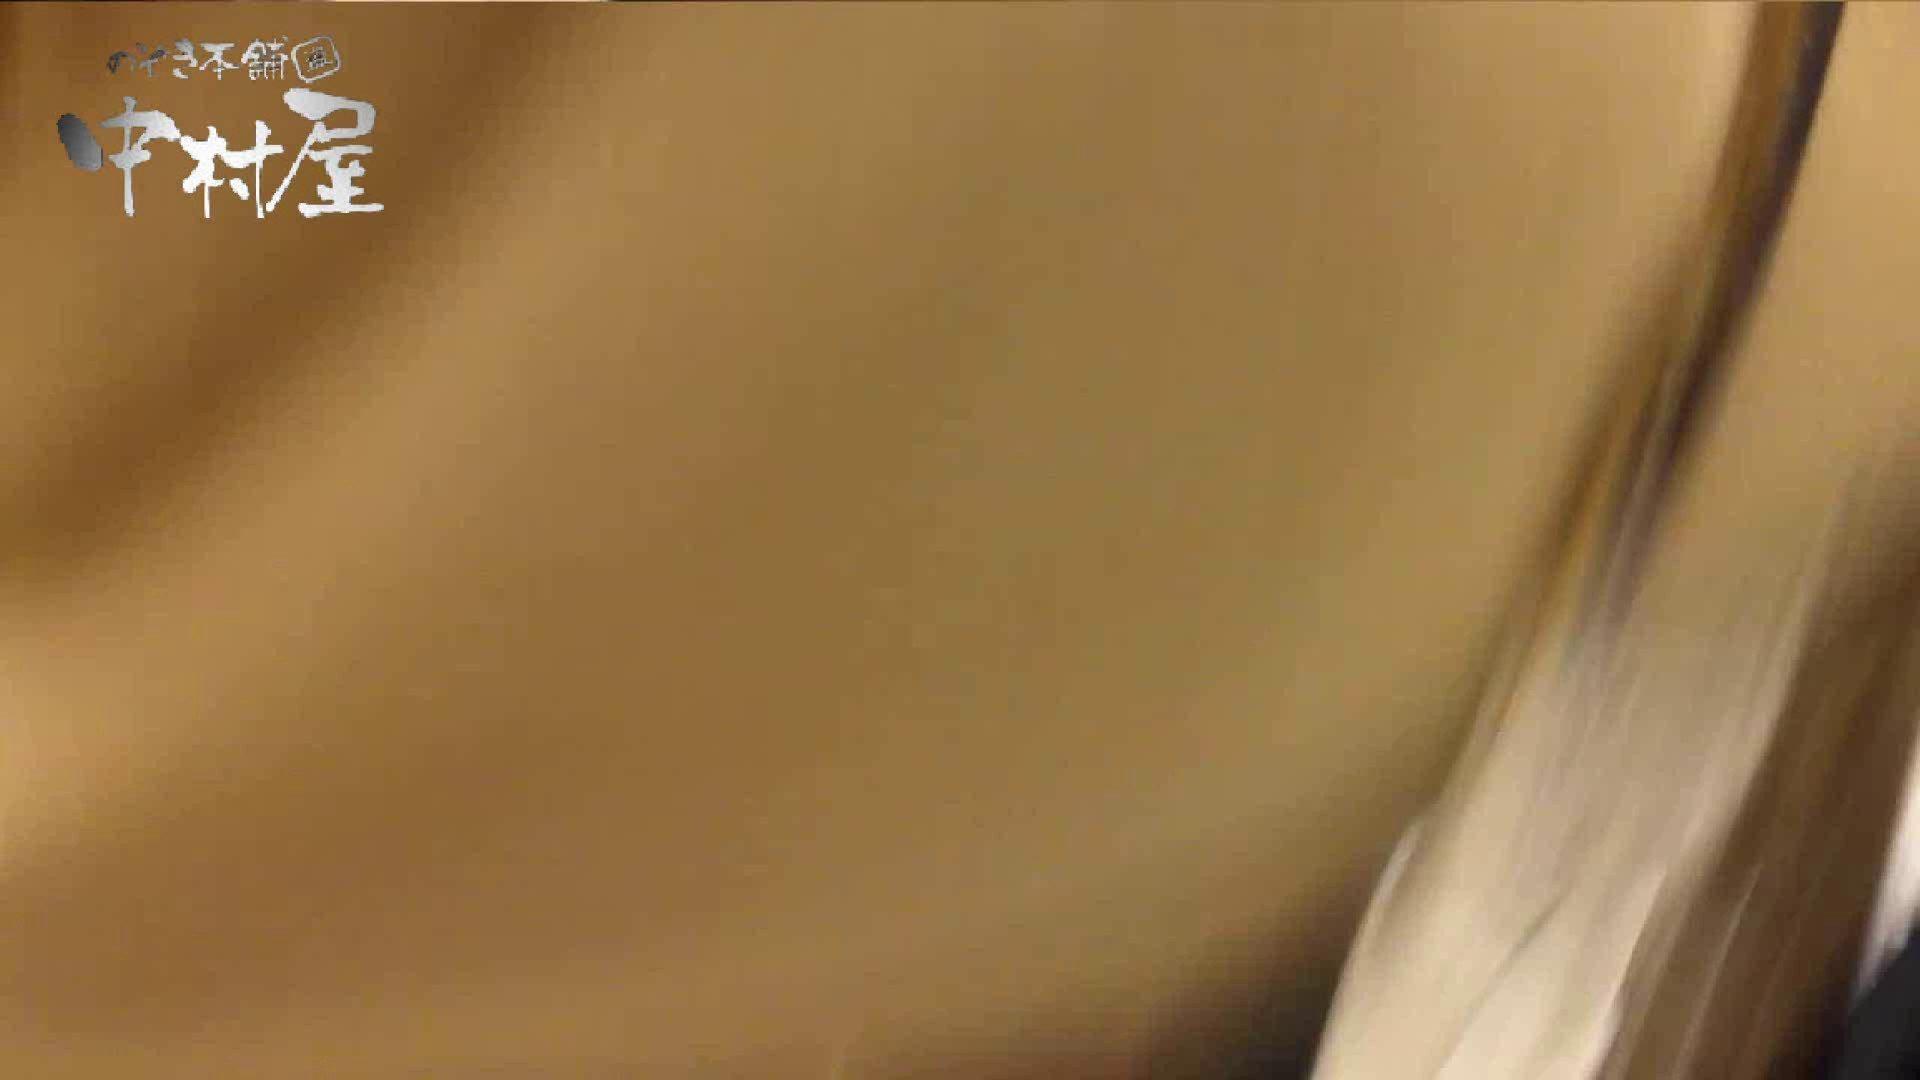 vol.52 美人アパレル胸チラ&パンチラ おとなしそうな店員の胸元にアタック! 接写 盗撮ワレメ無修正動画無料 86画像 63